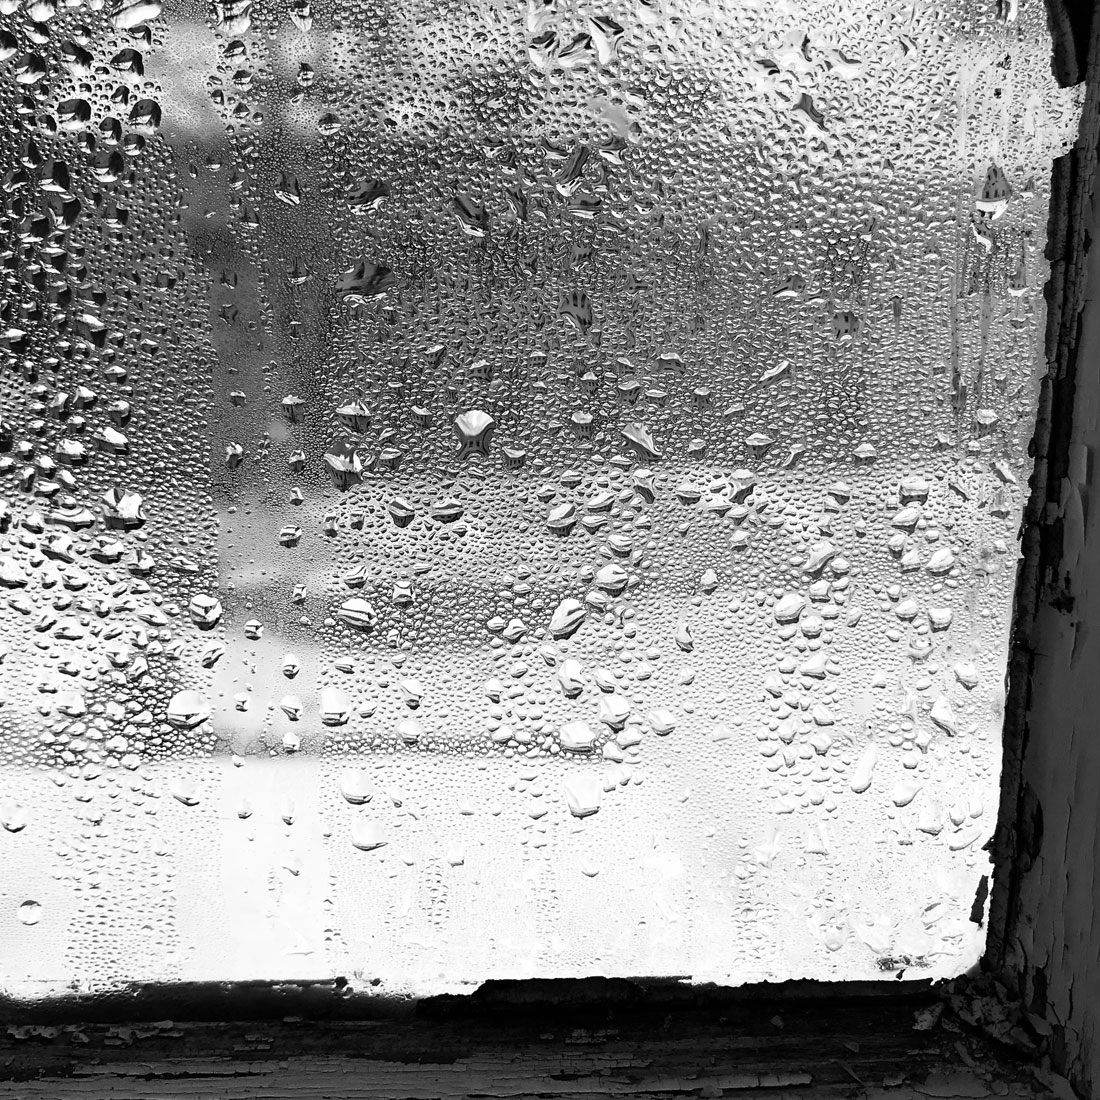 Susanna Ladda, 2019, Window